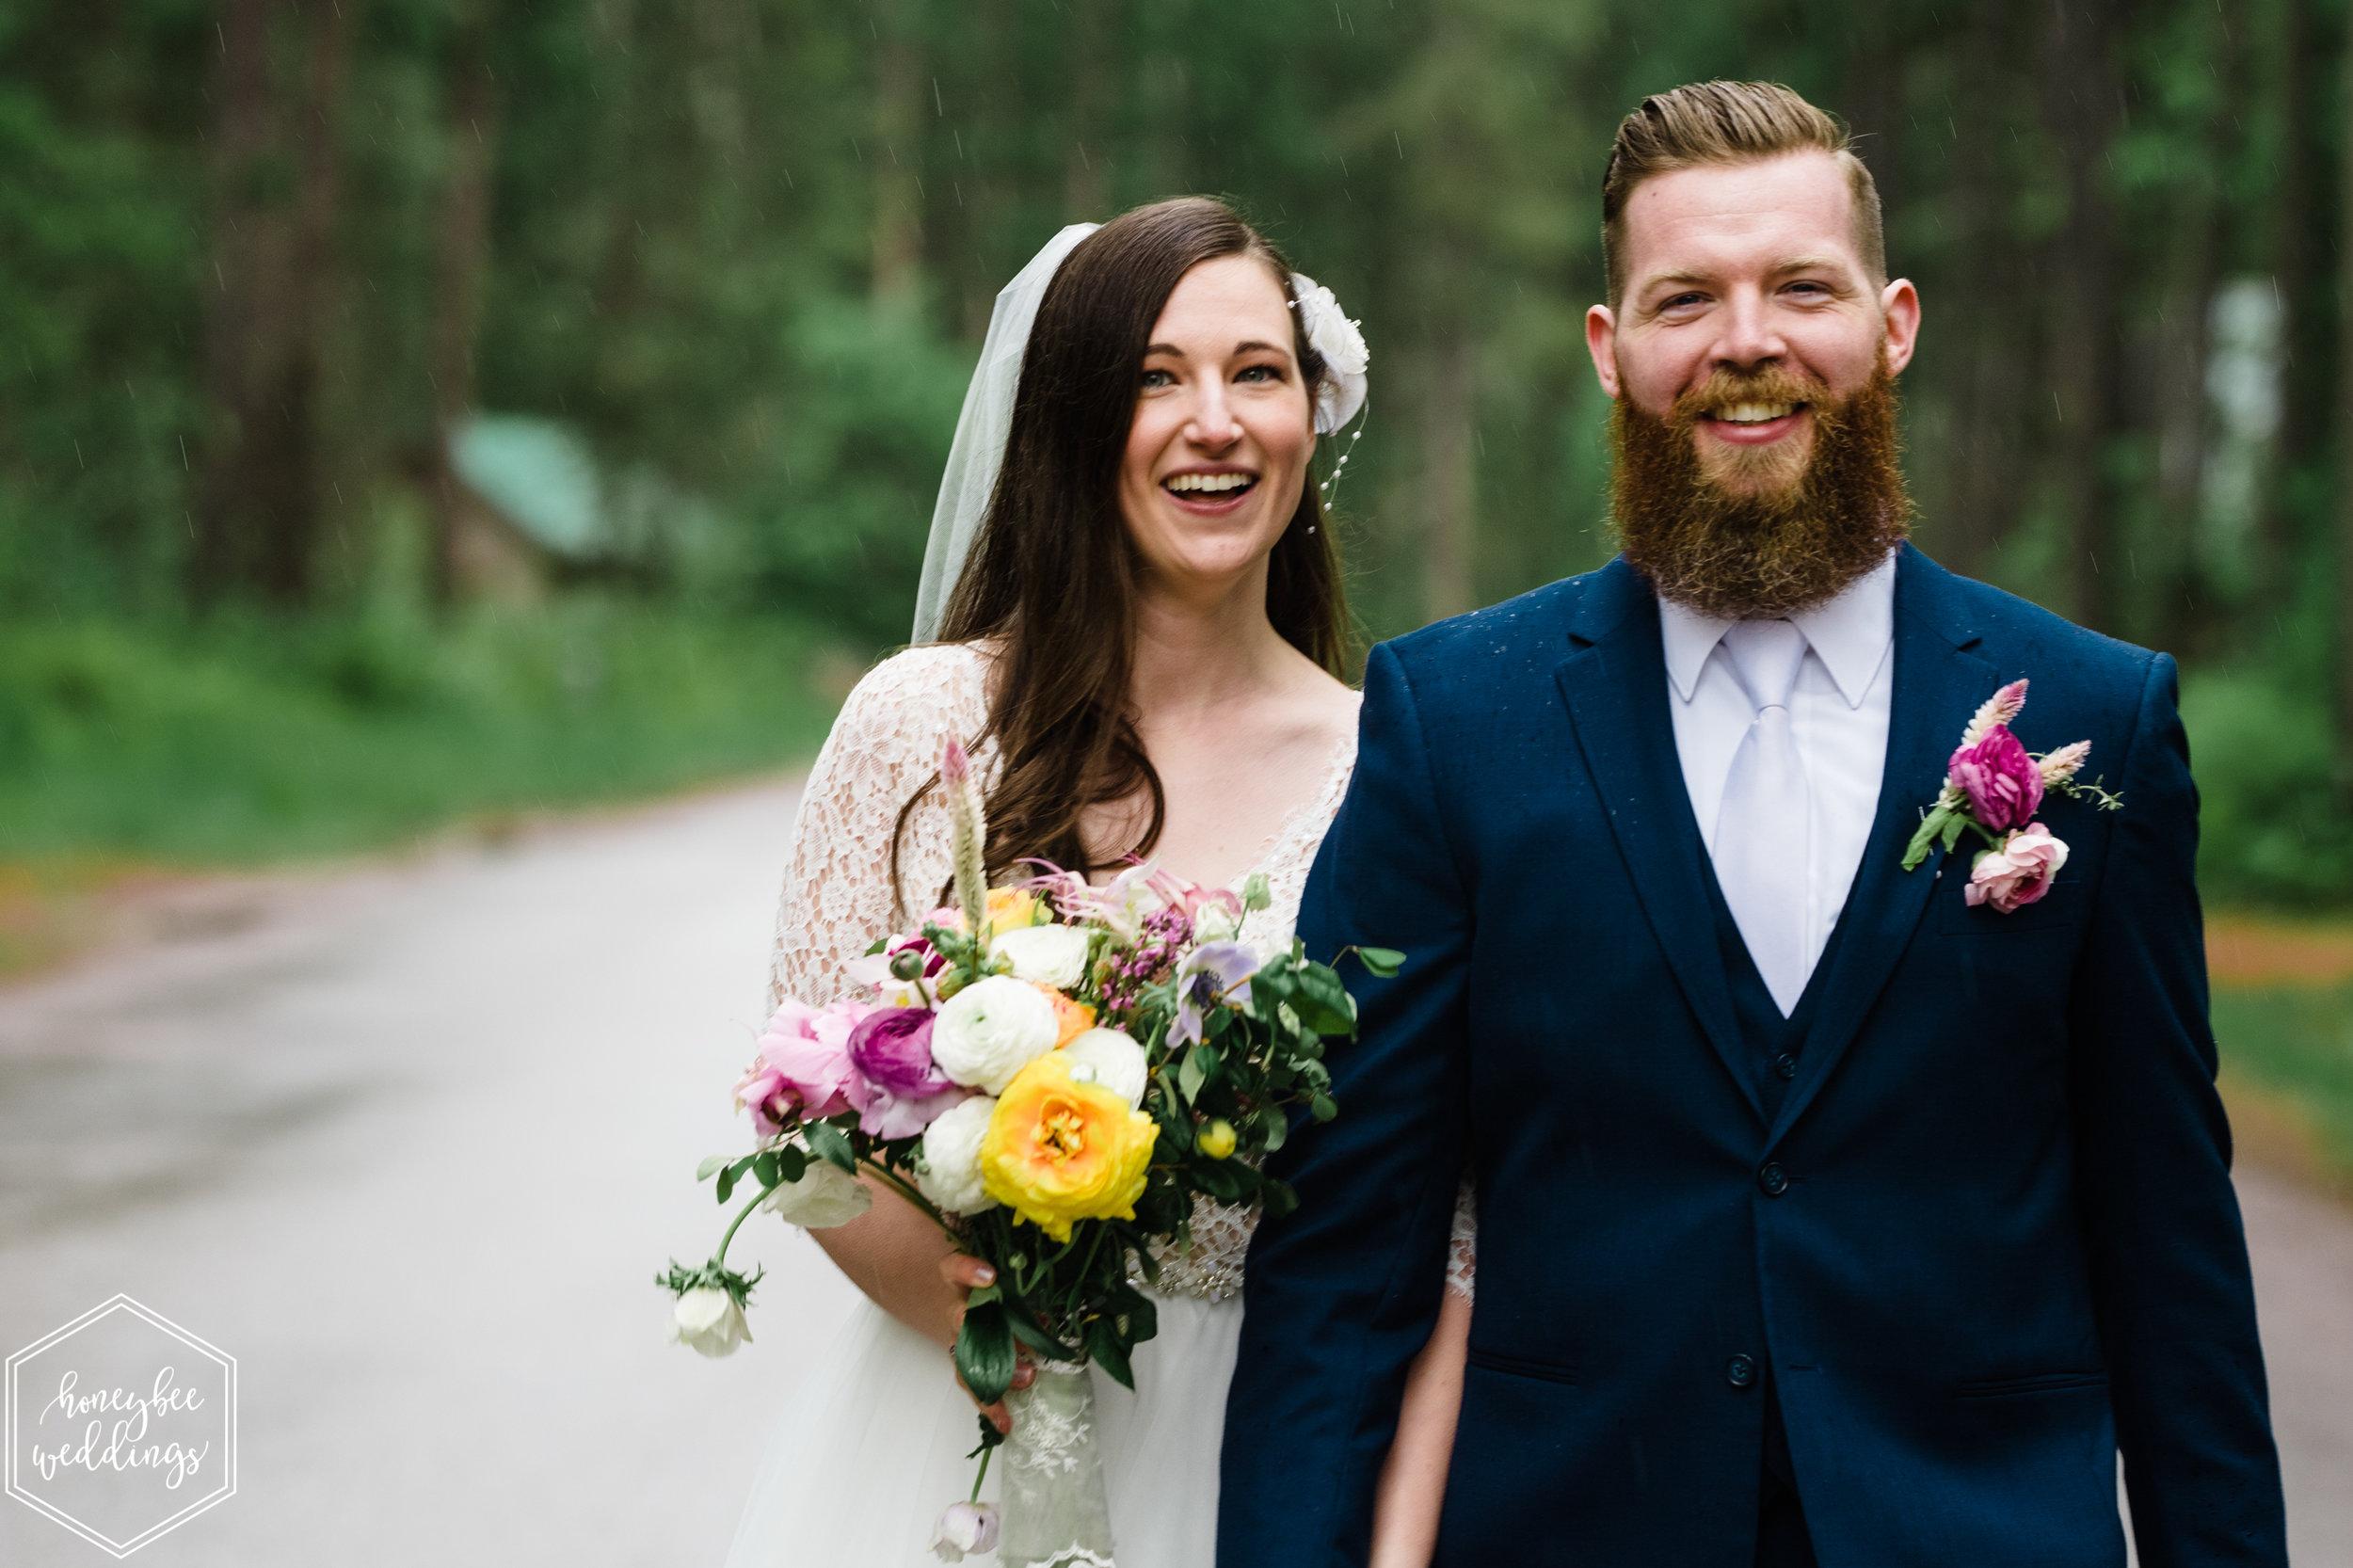 144Glacier National Park Wedding_Izaak Walton Inn Wedding_Honeybee Weddings_Norah & Kyle_June 08, 2019-2265.jpg